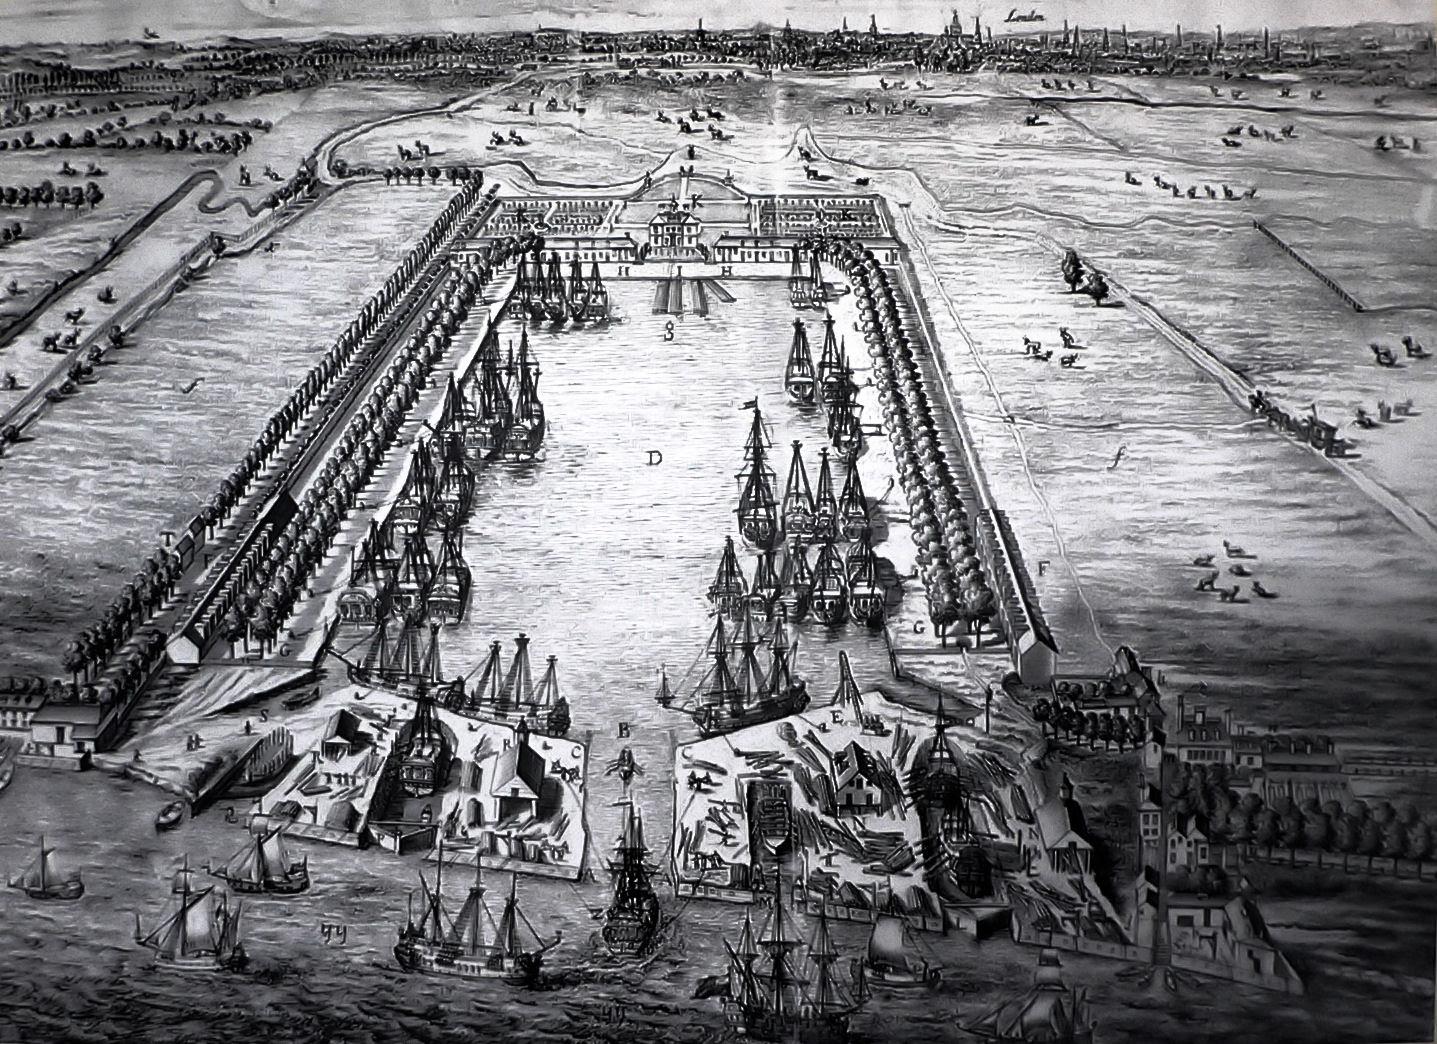 http://upload.wikimedia.org/wikipedia/commons/2/23/Howland_Great_Wet_Dock_1717.jpg